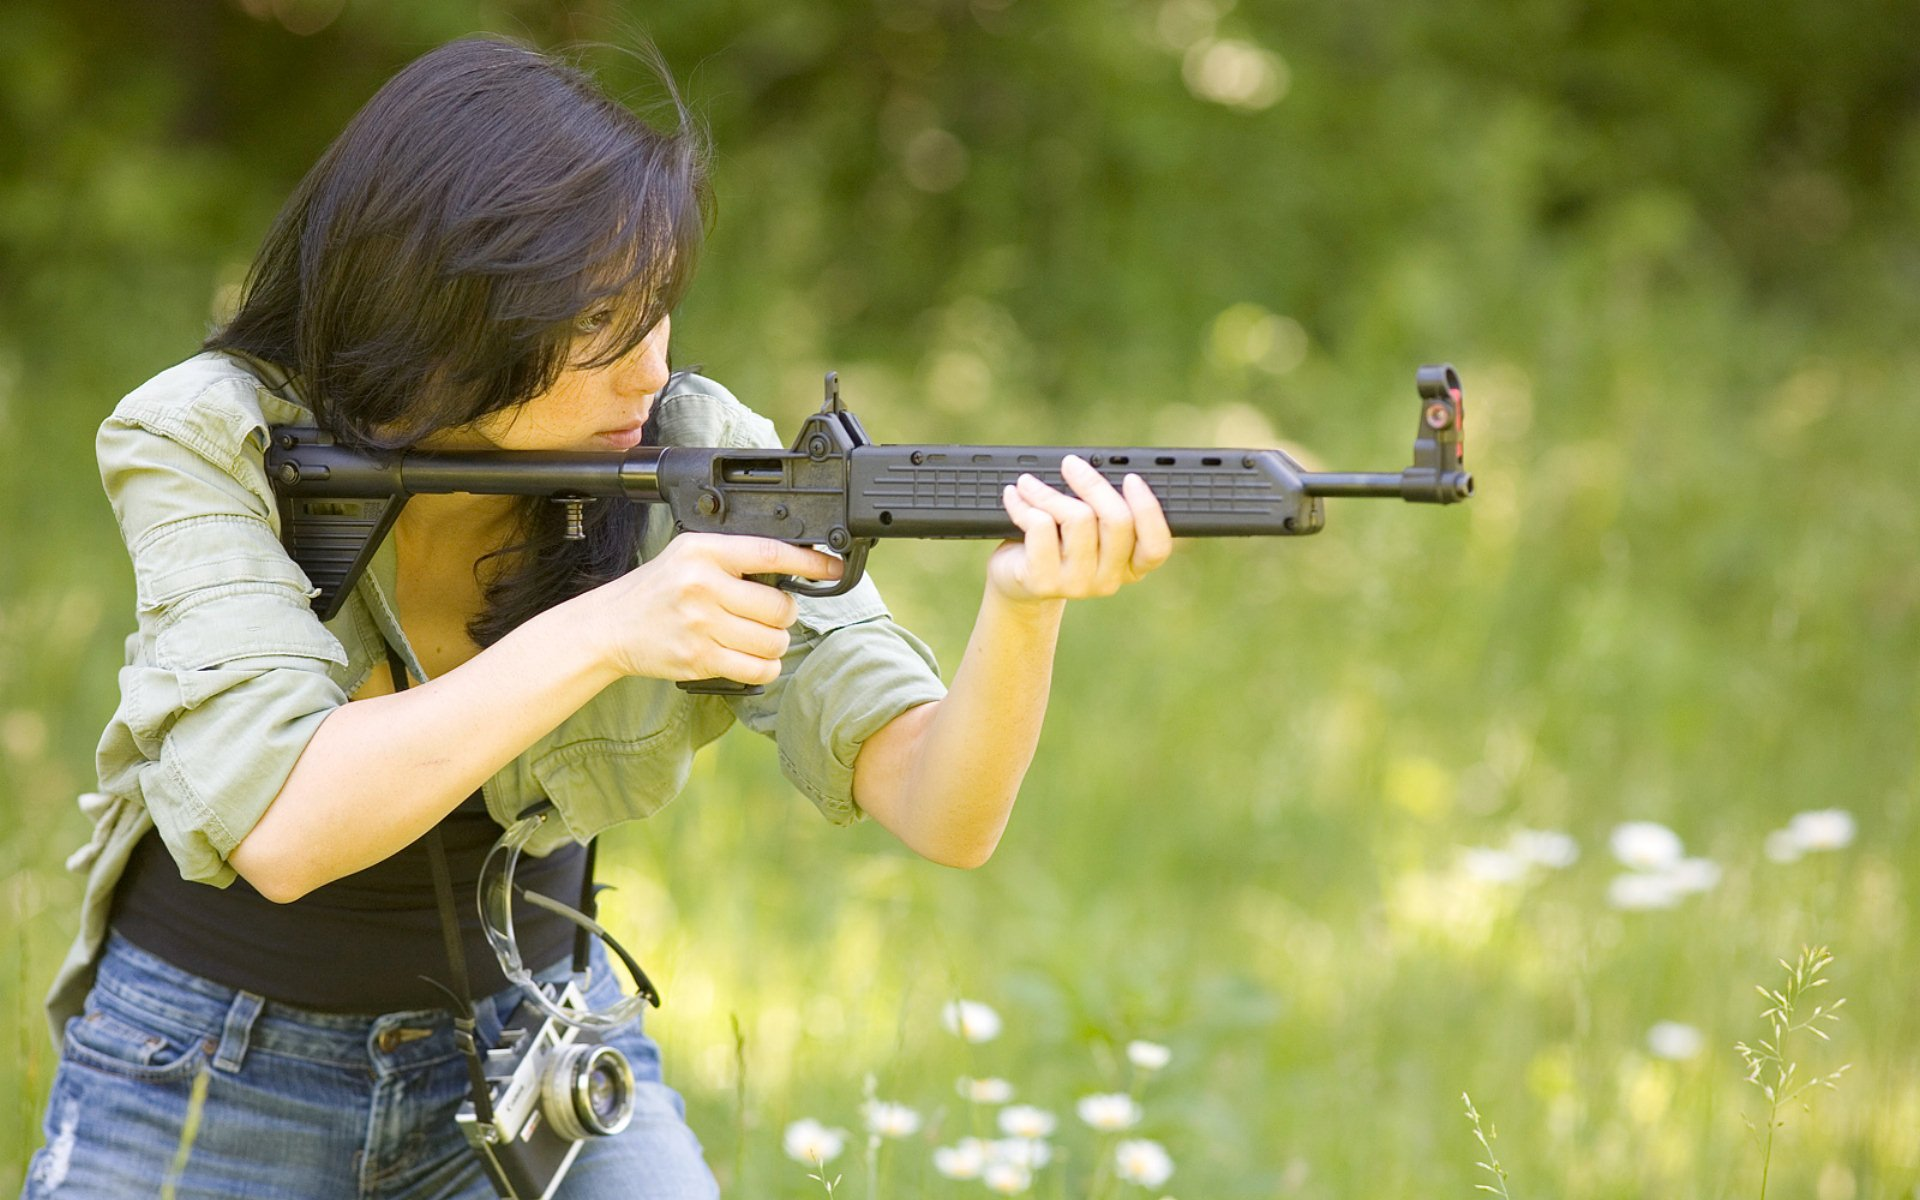 Punjabi Girl With Gun Hd Wallpaper Women And Guns Full Hd Wallpaper And Background Image